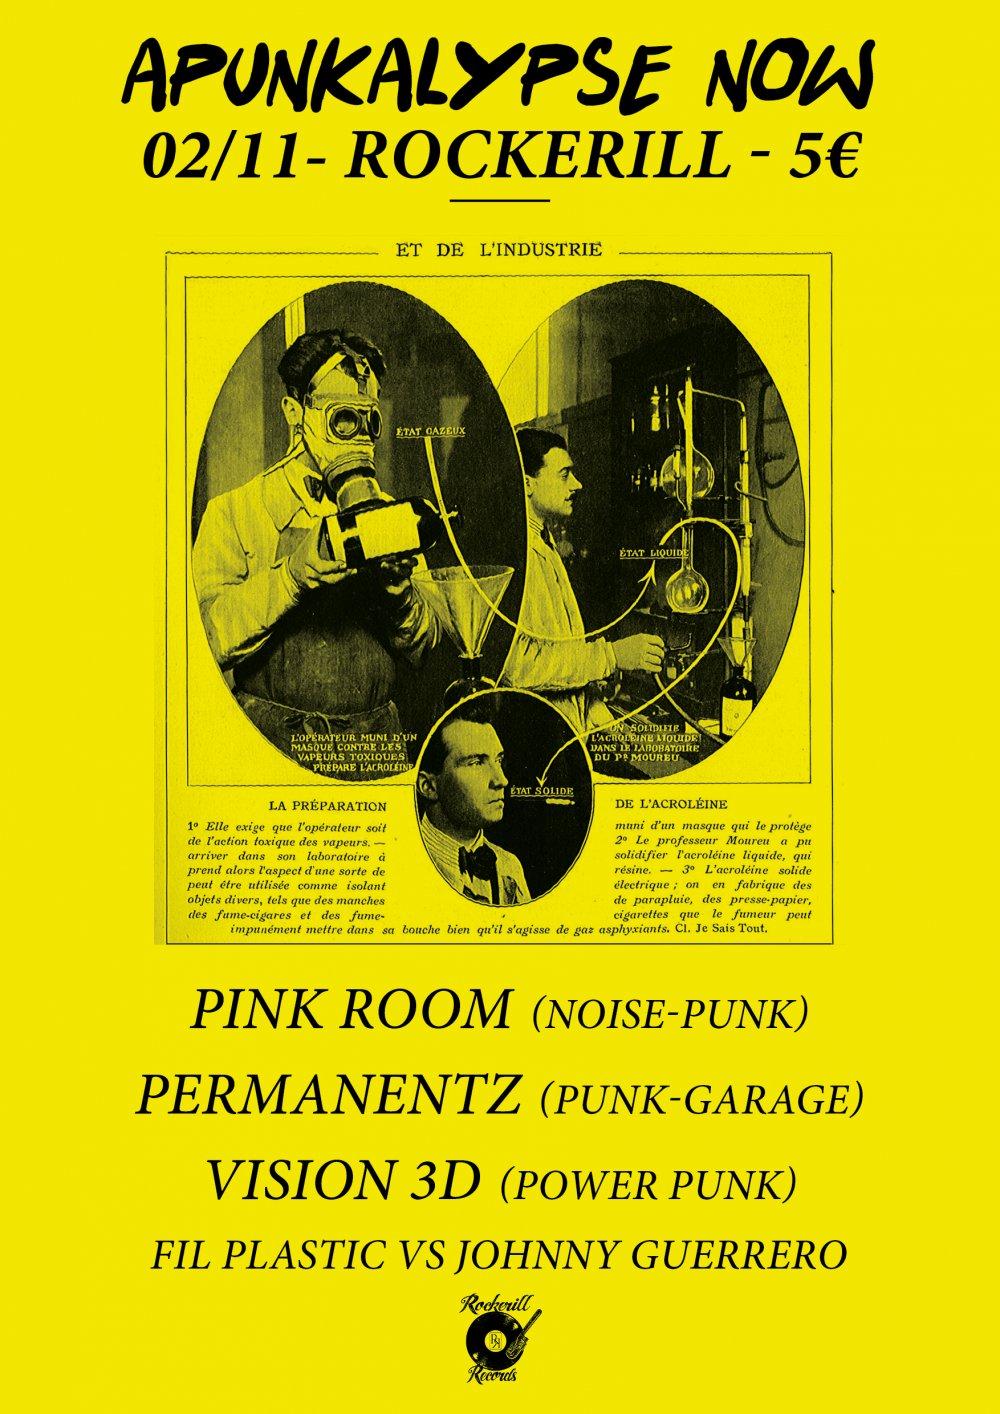 Apunkalypse Now! Pink Room/Vision 3D/ Permanentz